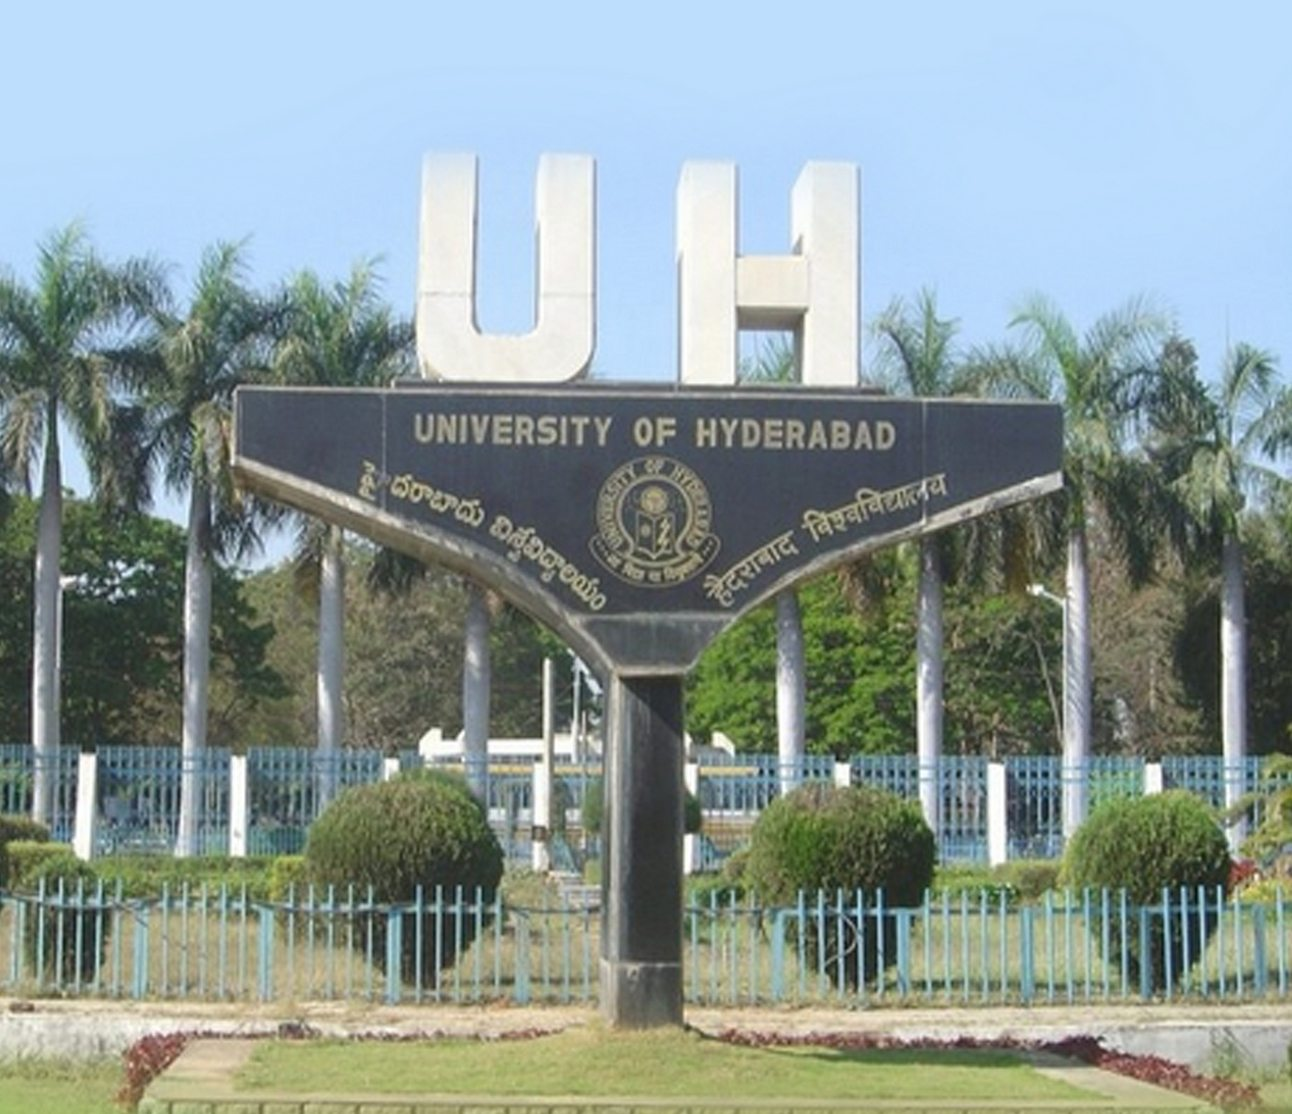 University-of-Hyderabad